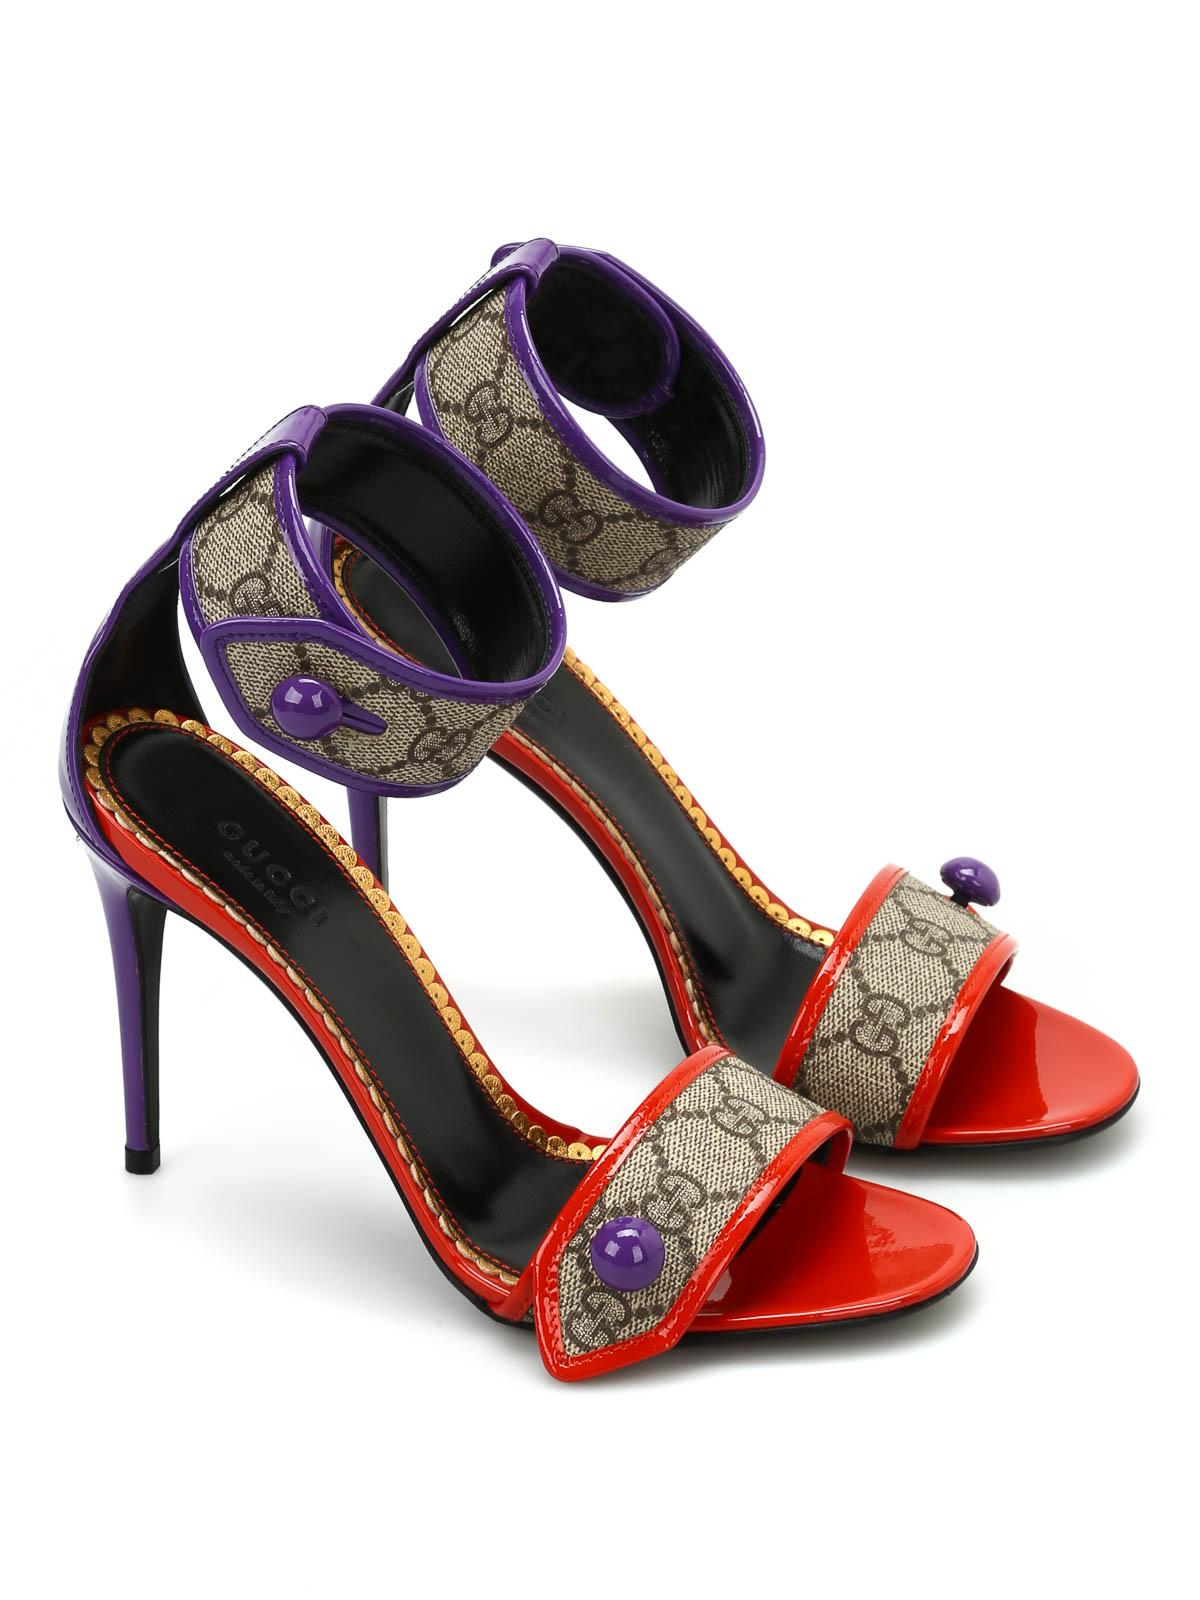 a3fe4975c9b9 Gucci - GG Supreme high sandals - sandals - 408273KLQD09764